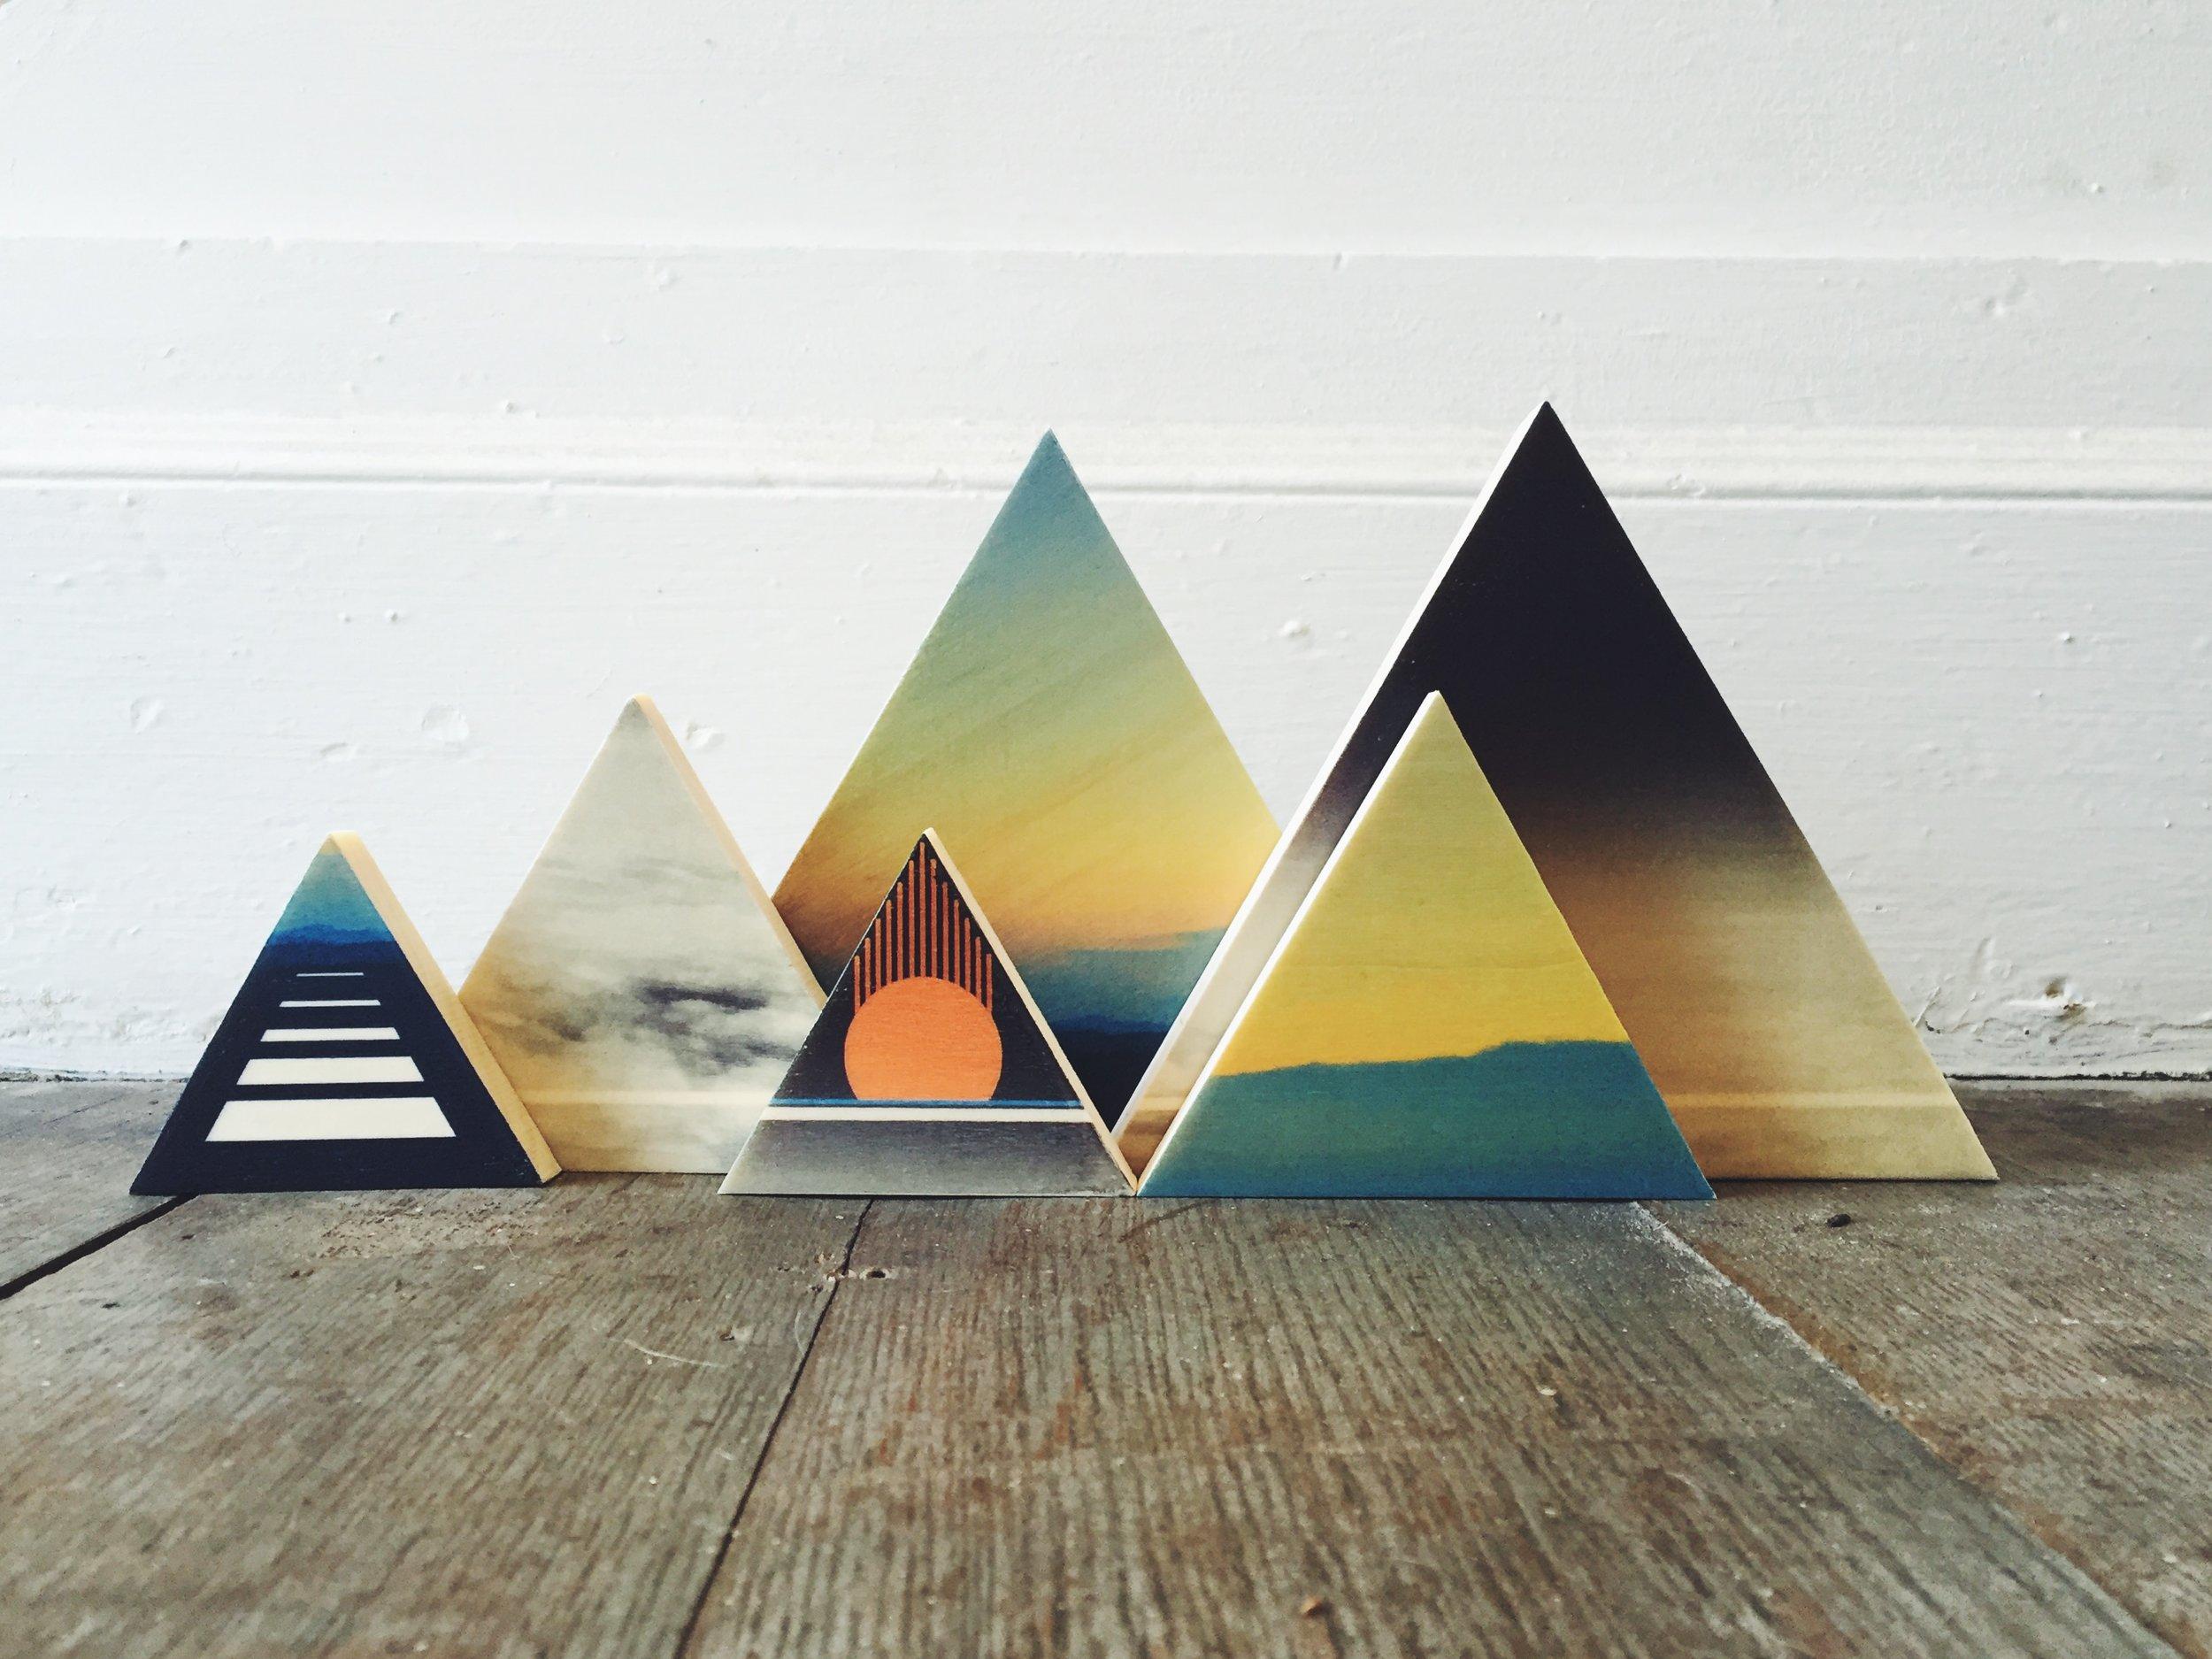 Triangle Mountain range